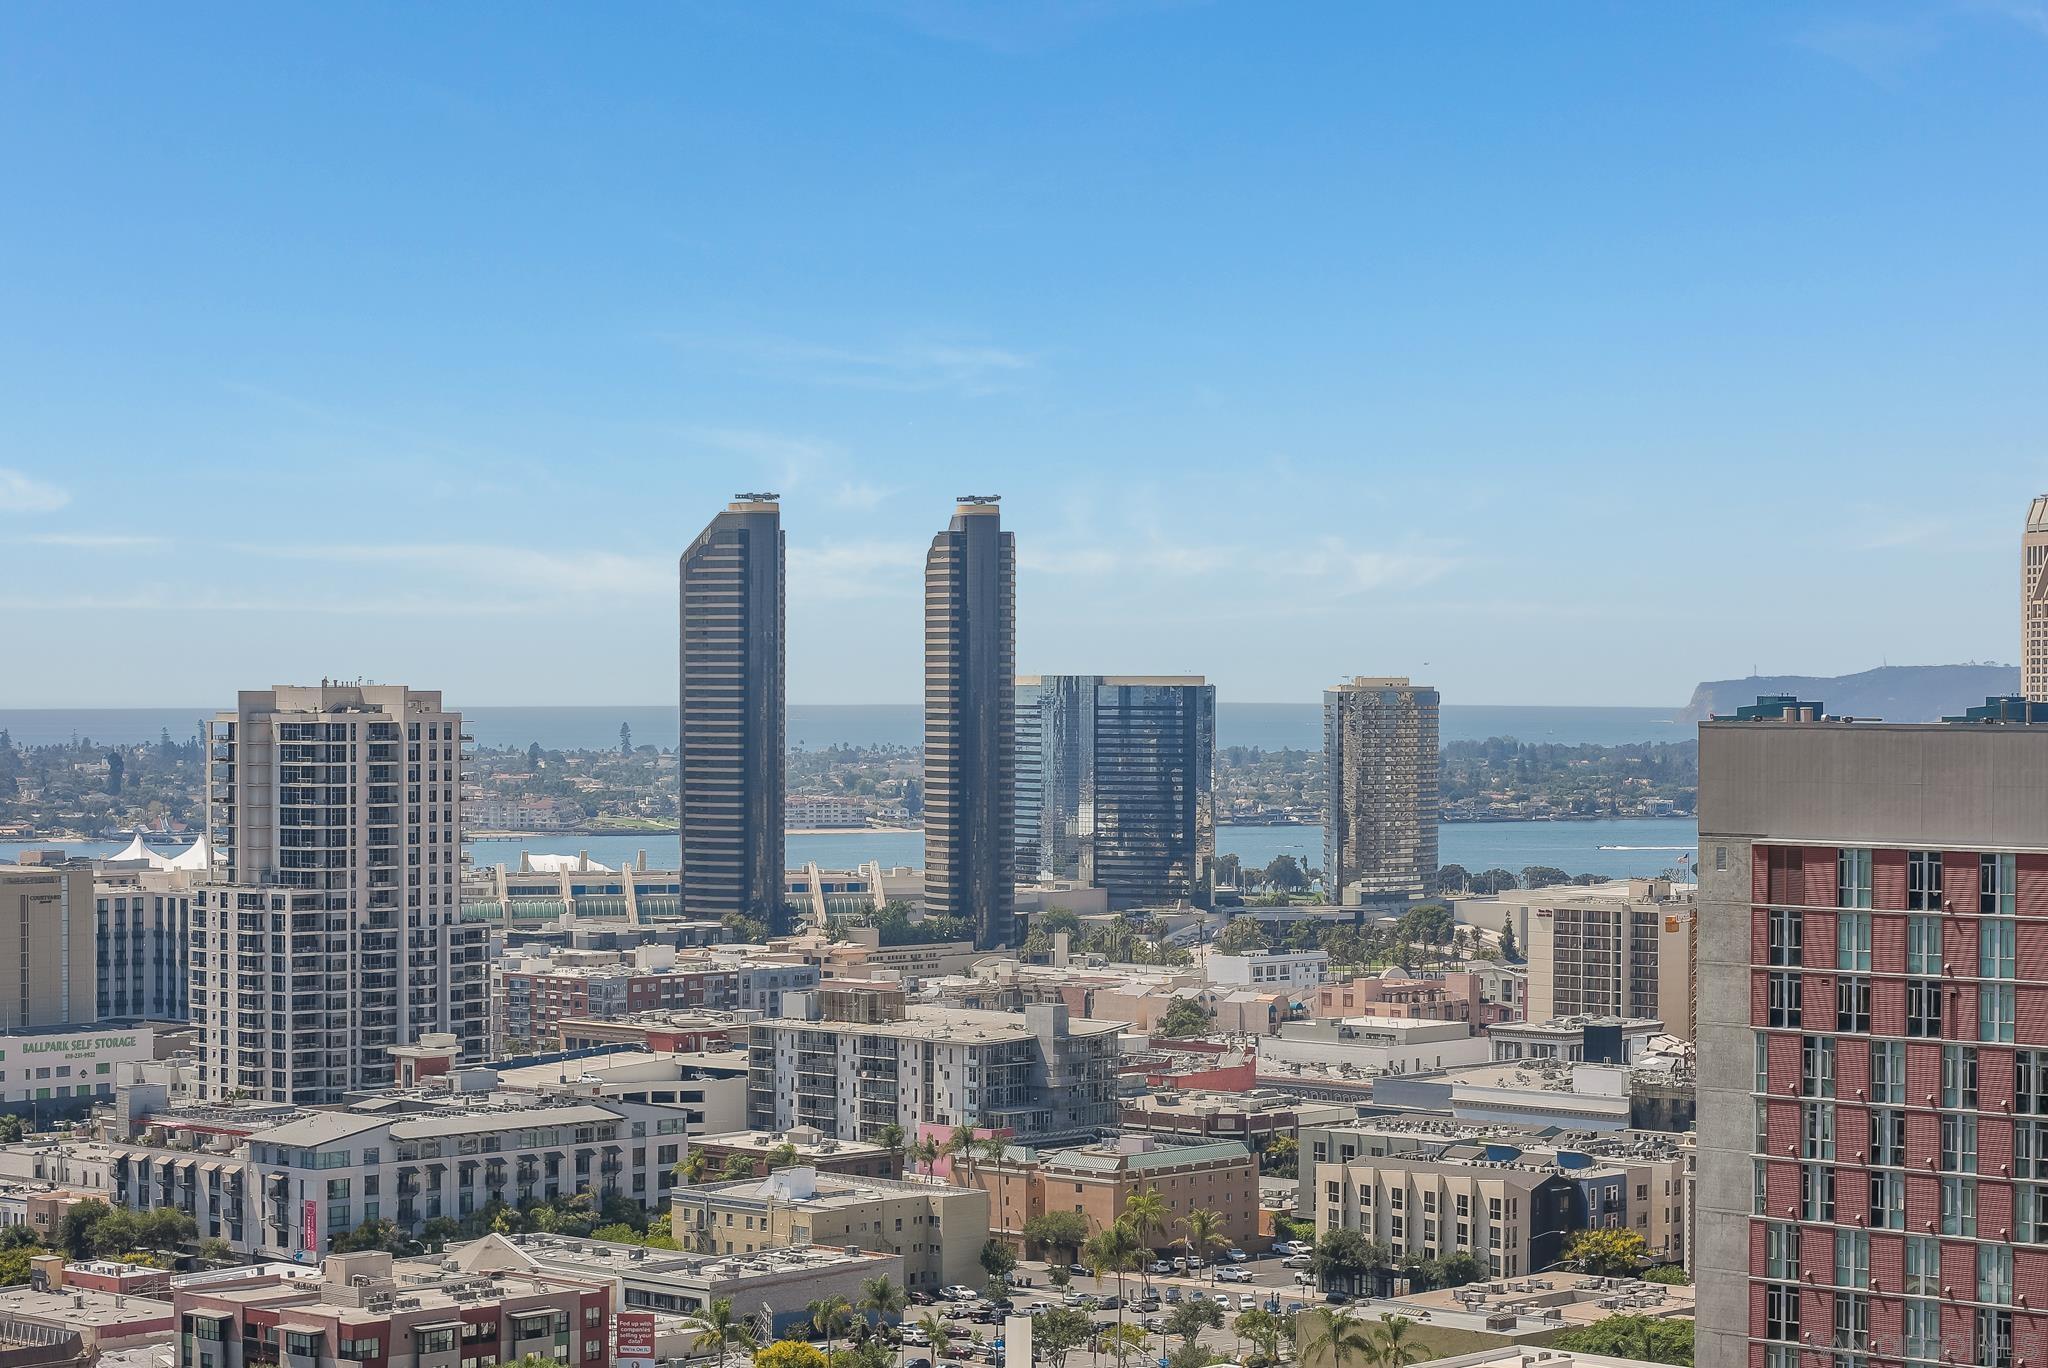 MLS 210025660 San Diego Condo for sale